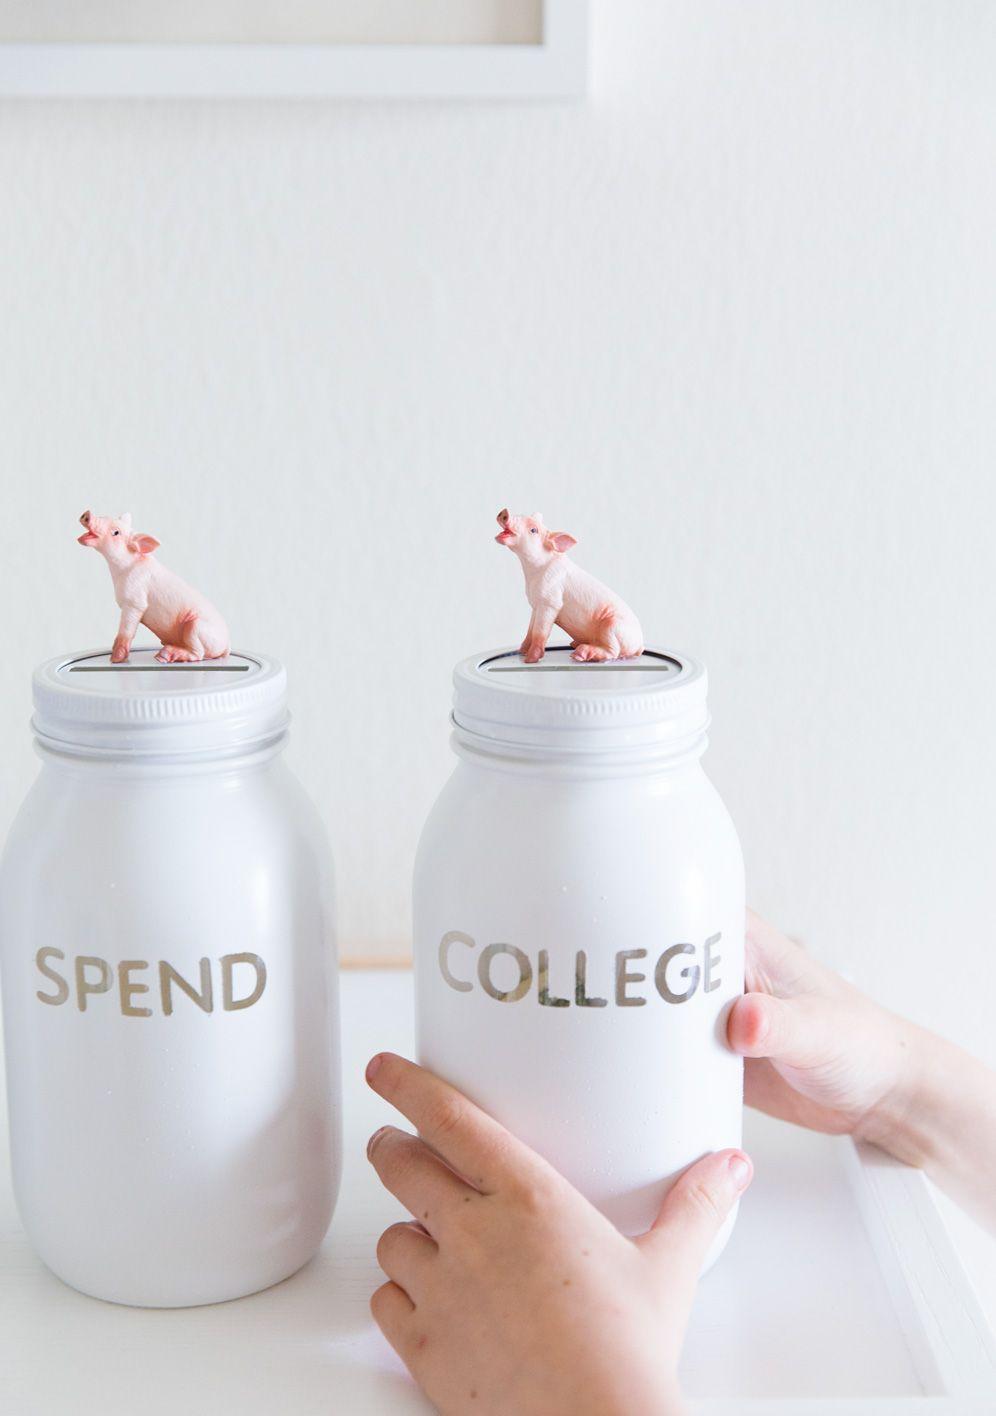 M s de 25 ideas incre bles sobre diy hucha de cerdo en for Piggy bank ideas diy